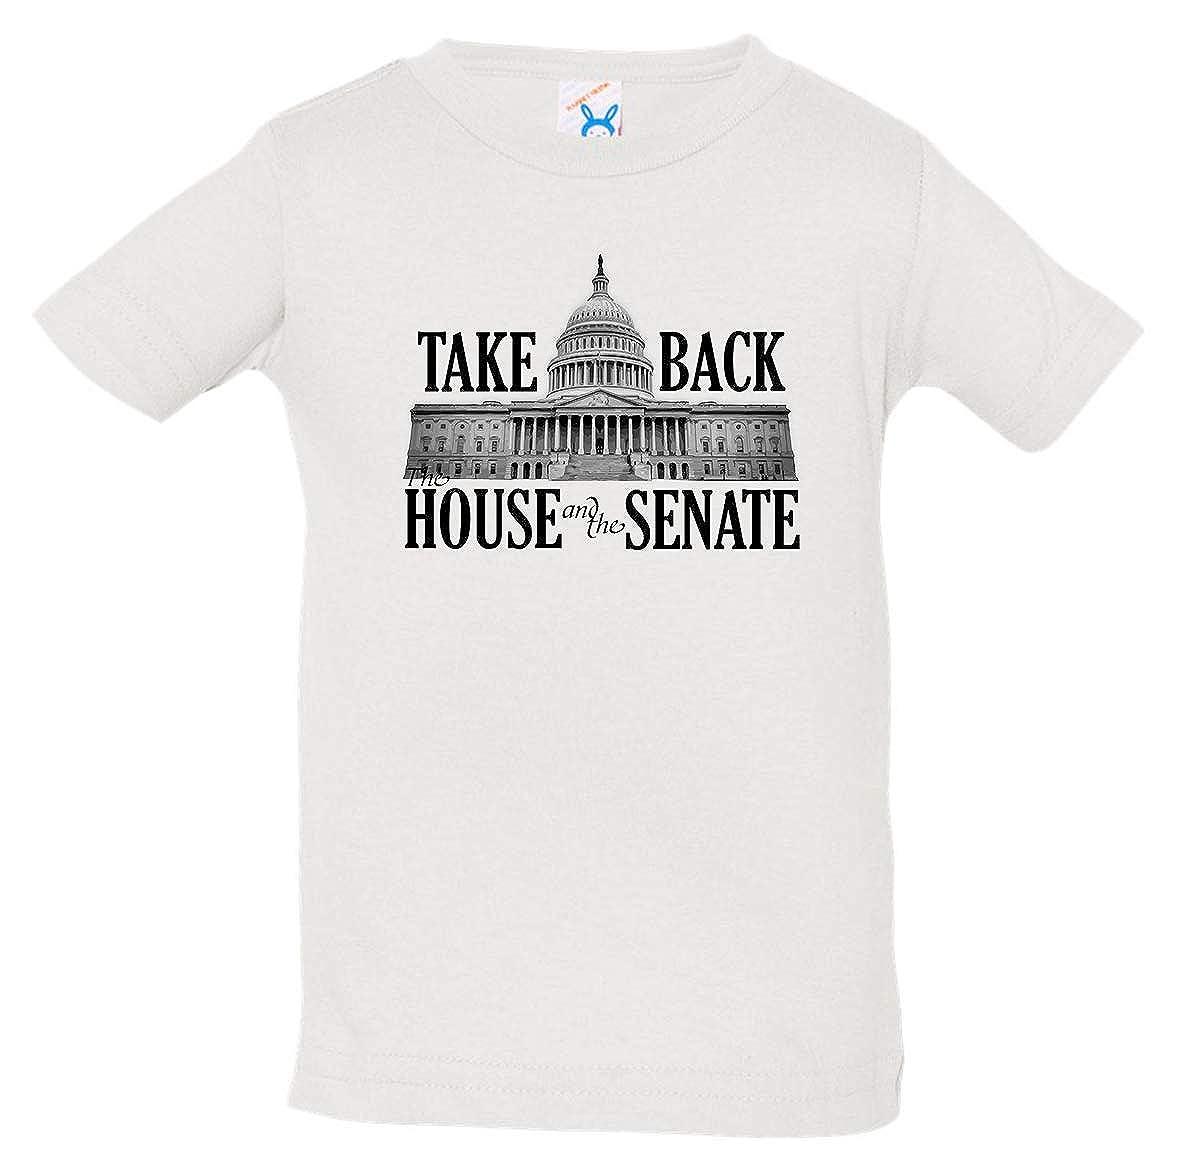 Tenacitee Babys Take Back The House and Senate Shirt